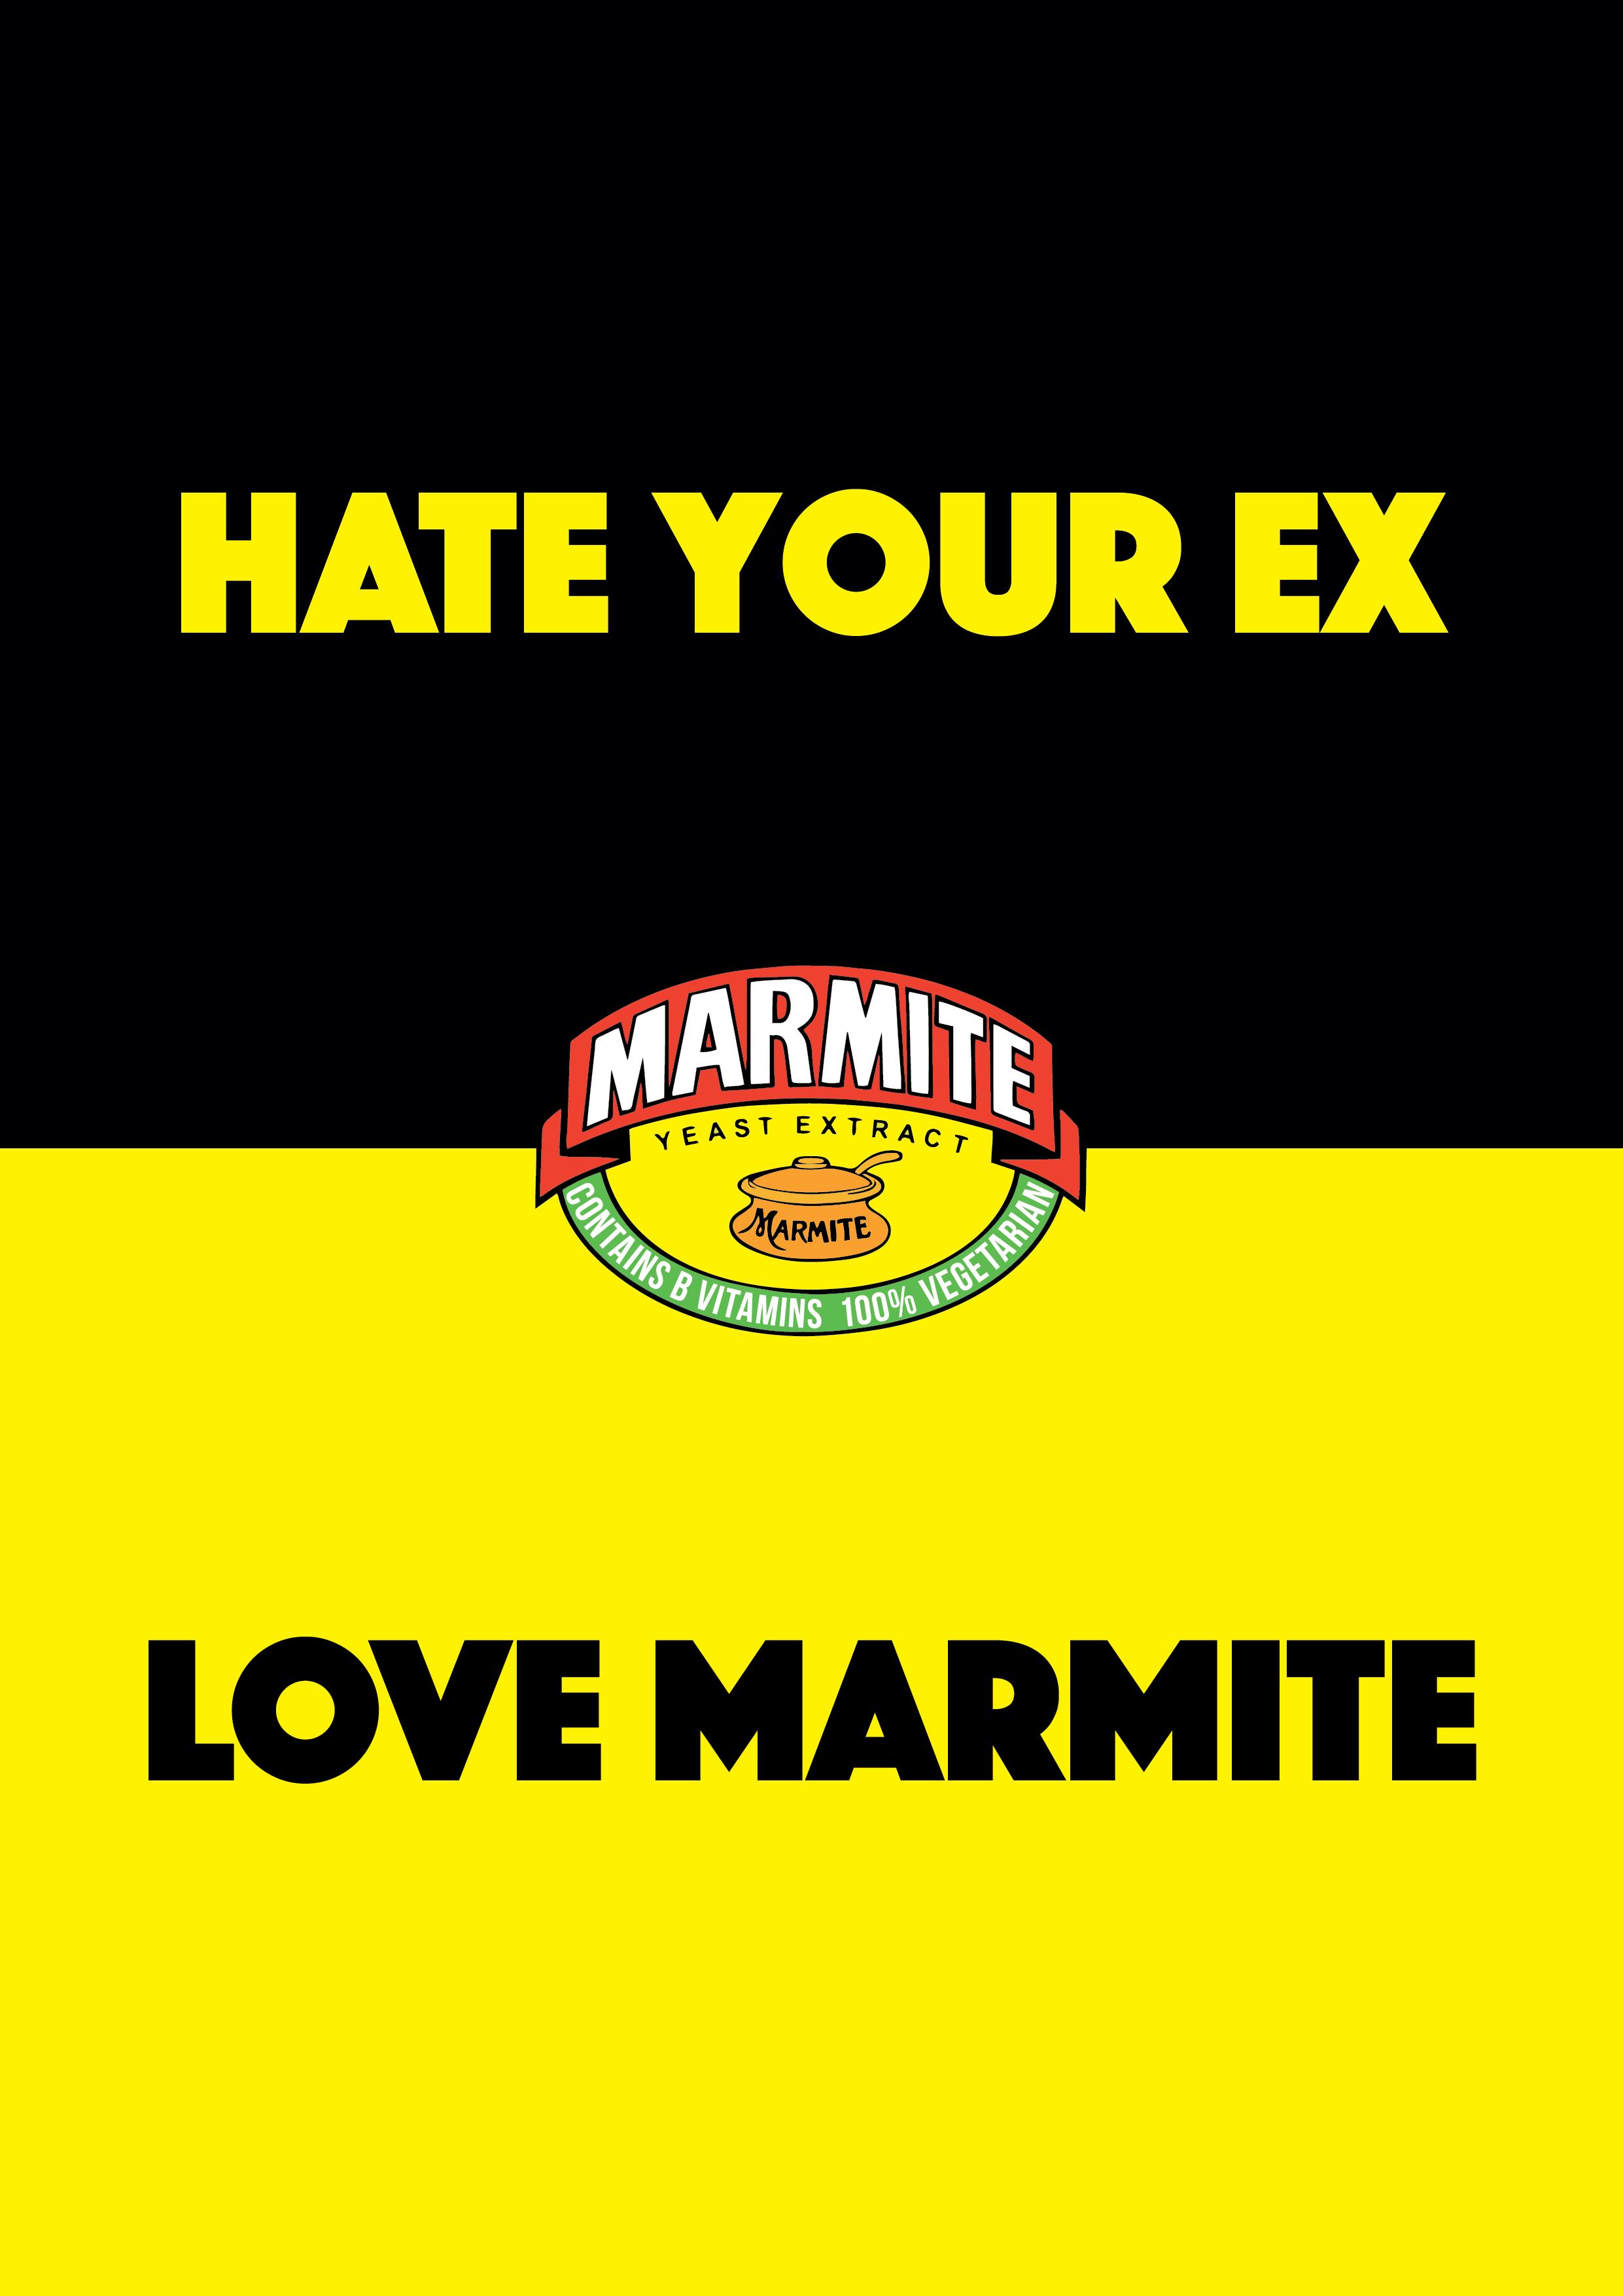 Marmate-07.png